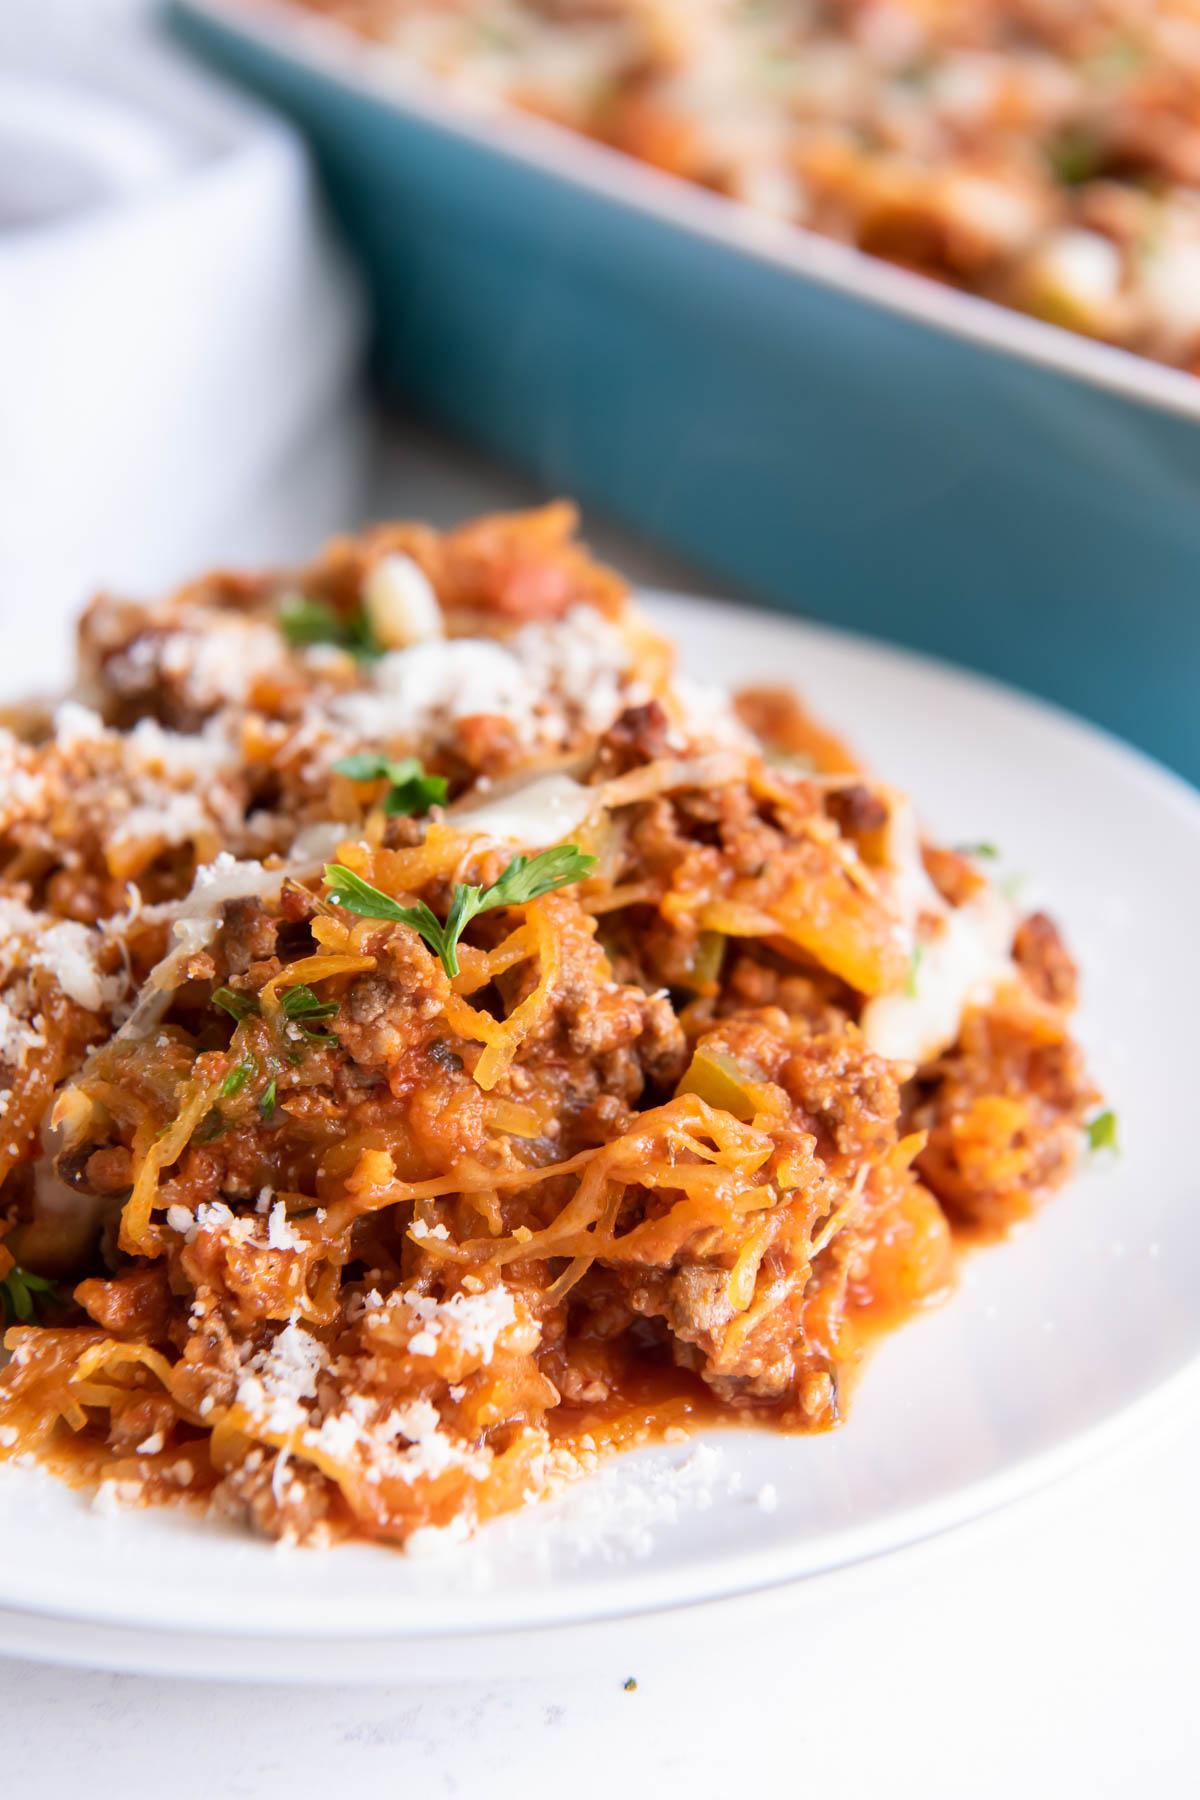 serving of spaghetti squash casserole on white plate